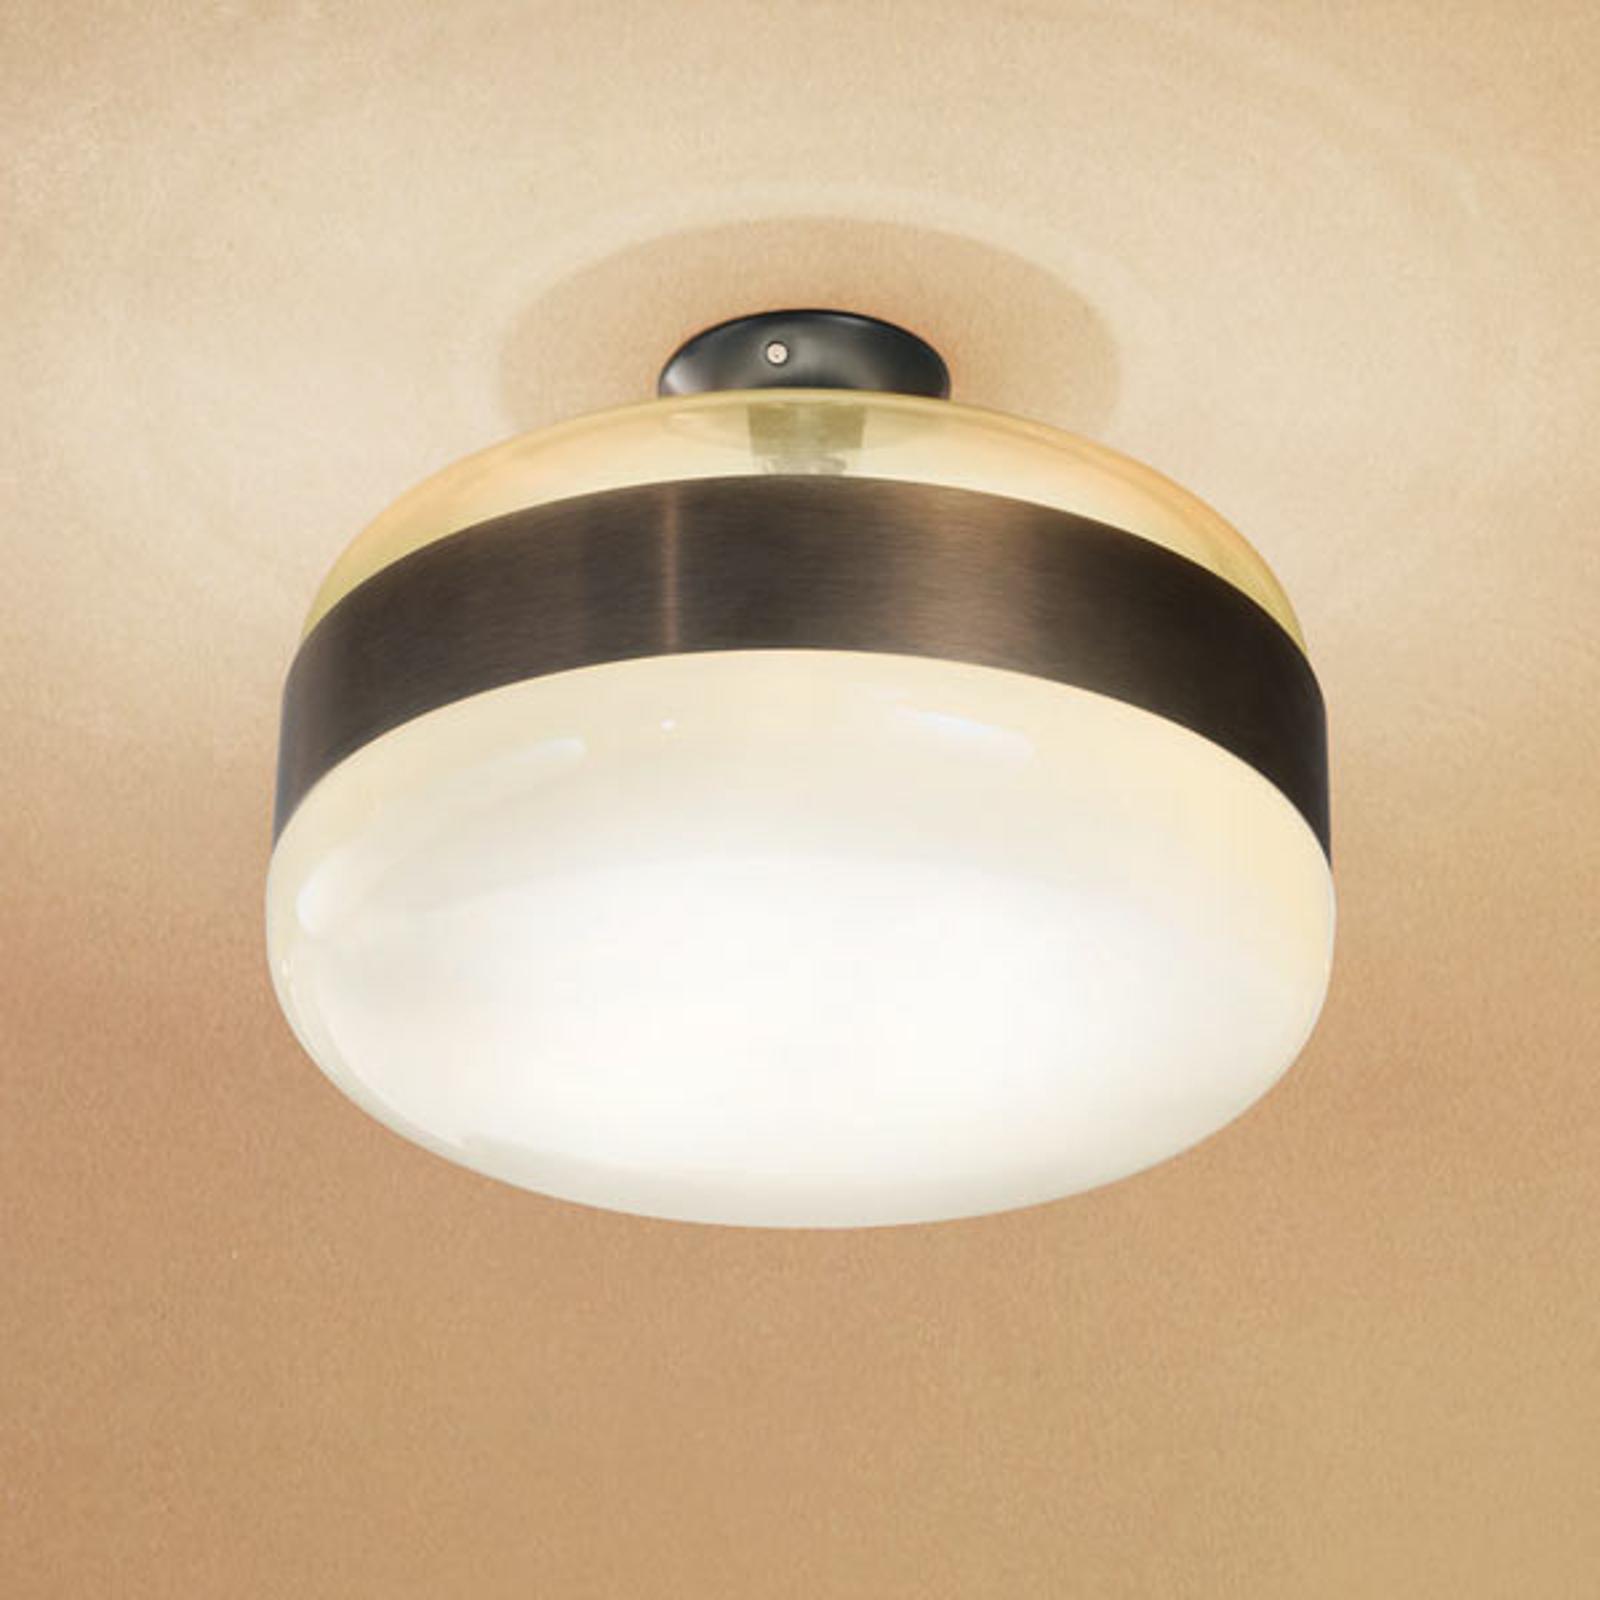 Lampa sufitowa Futura ze szkła Murano, brązowa